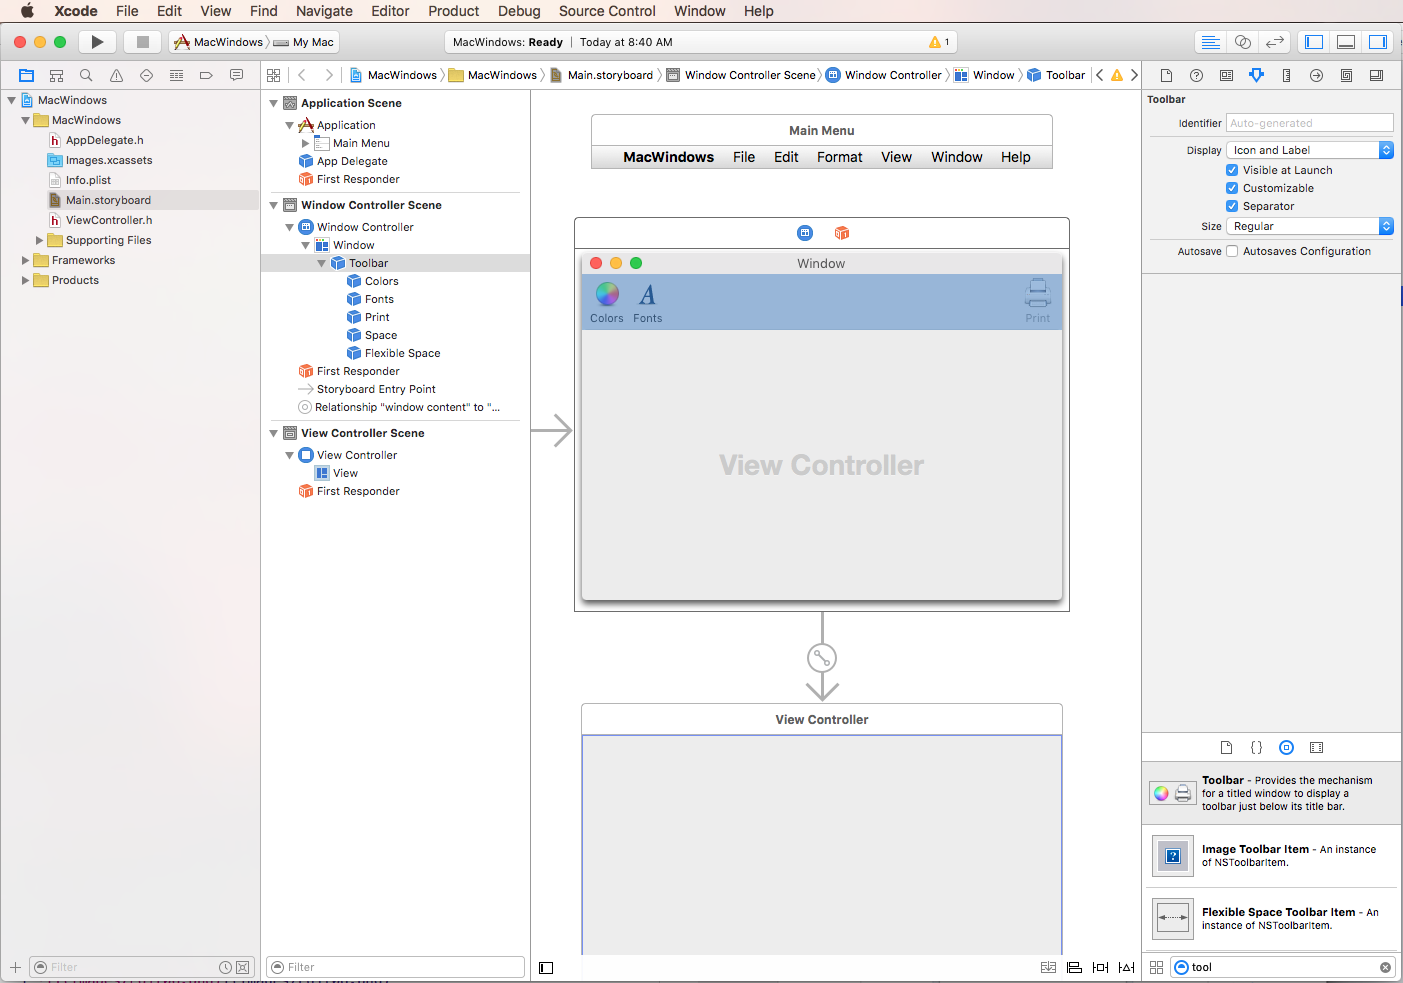 Windows In Xamarinmac Xamarin Microsoft Docs Aug Capacity To Draw Schematics Title Bar And Youll Be Next